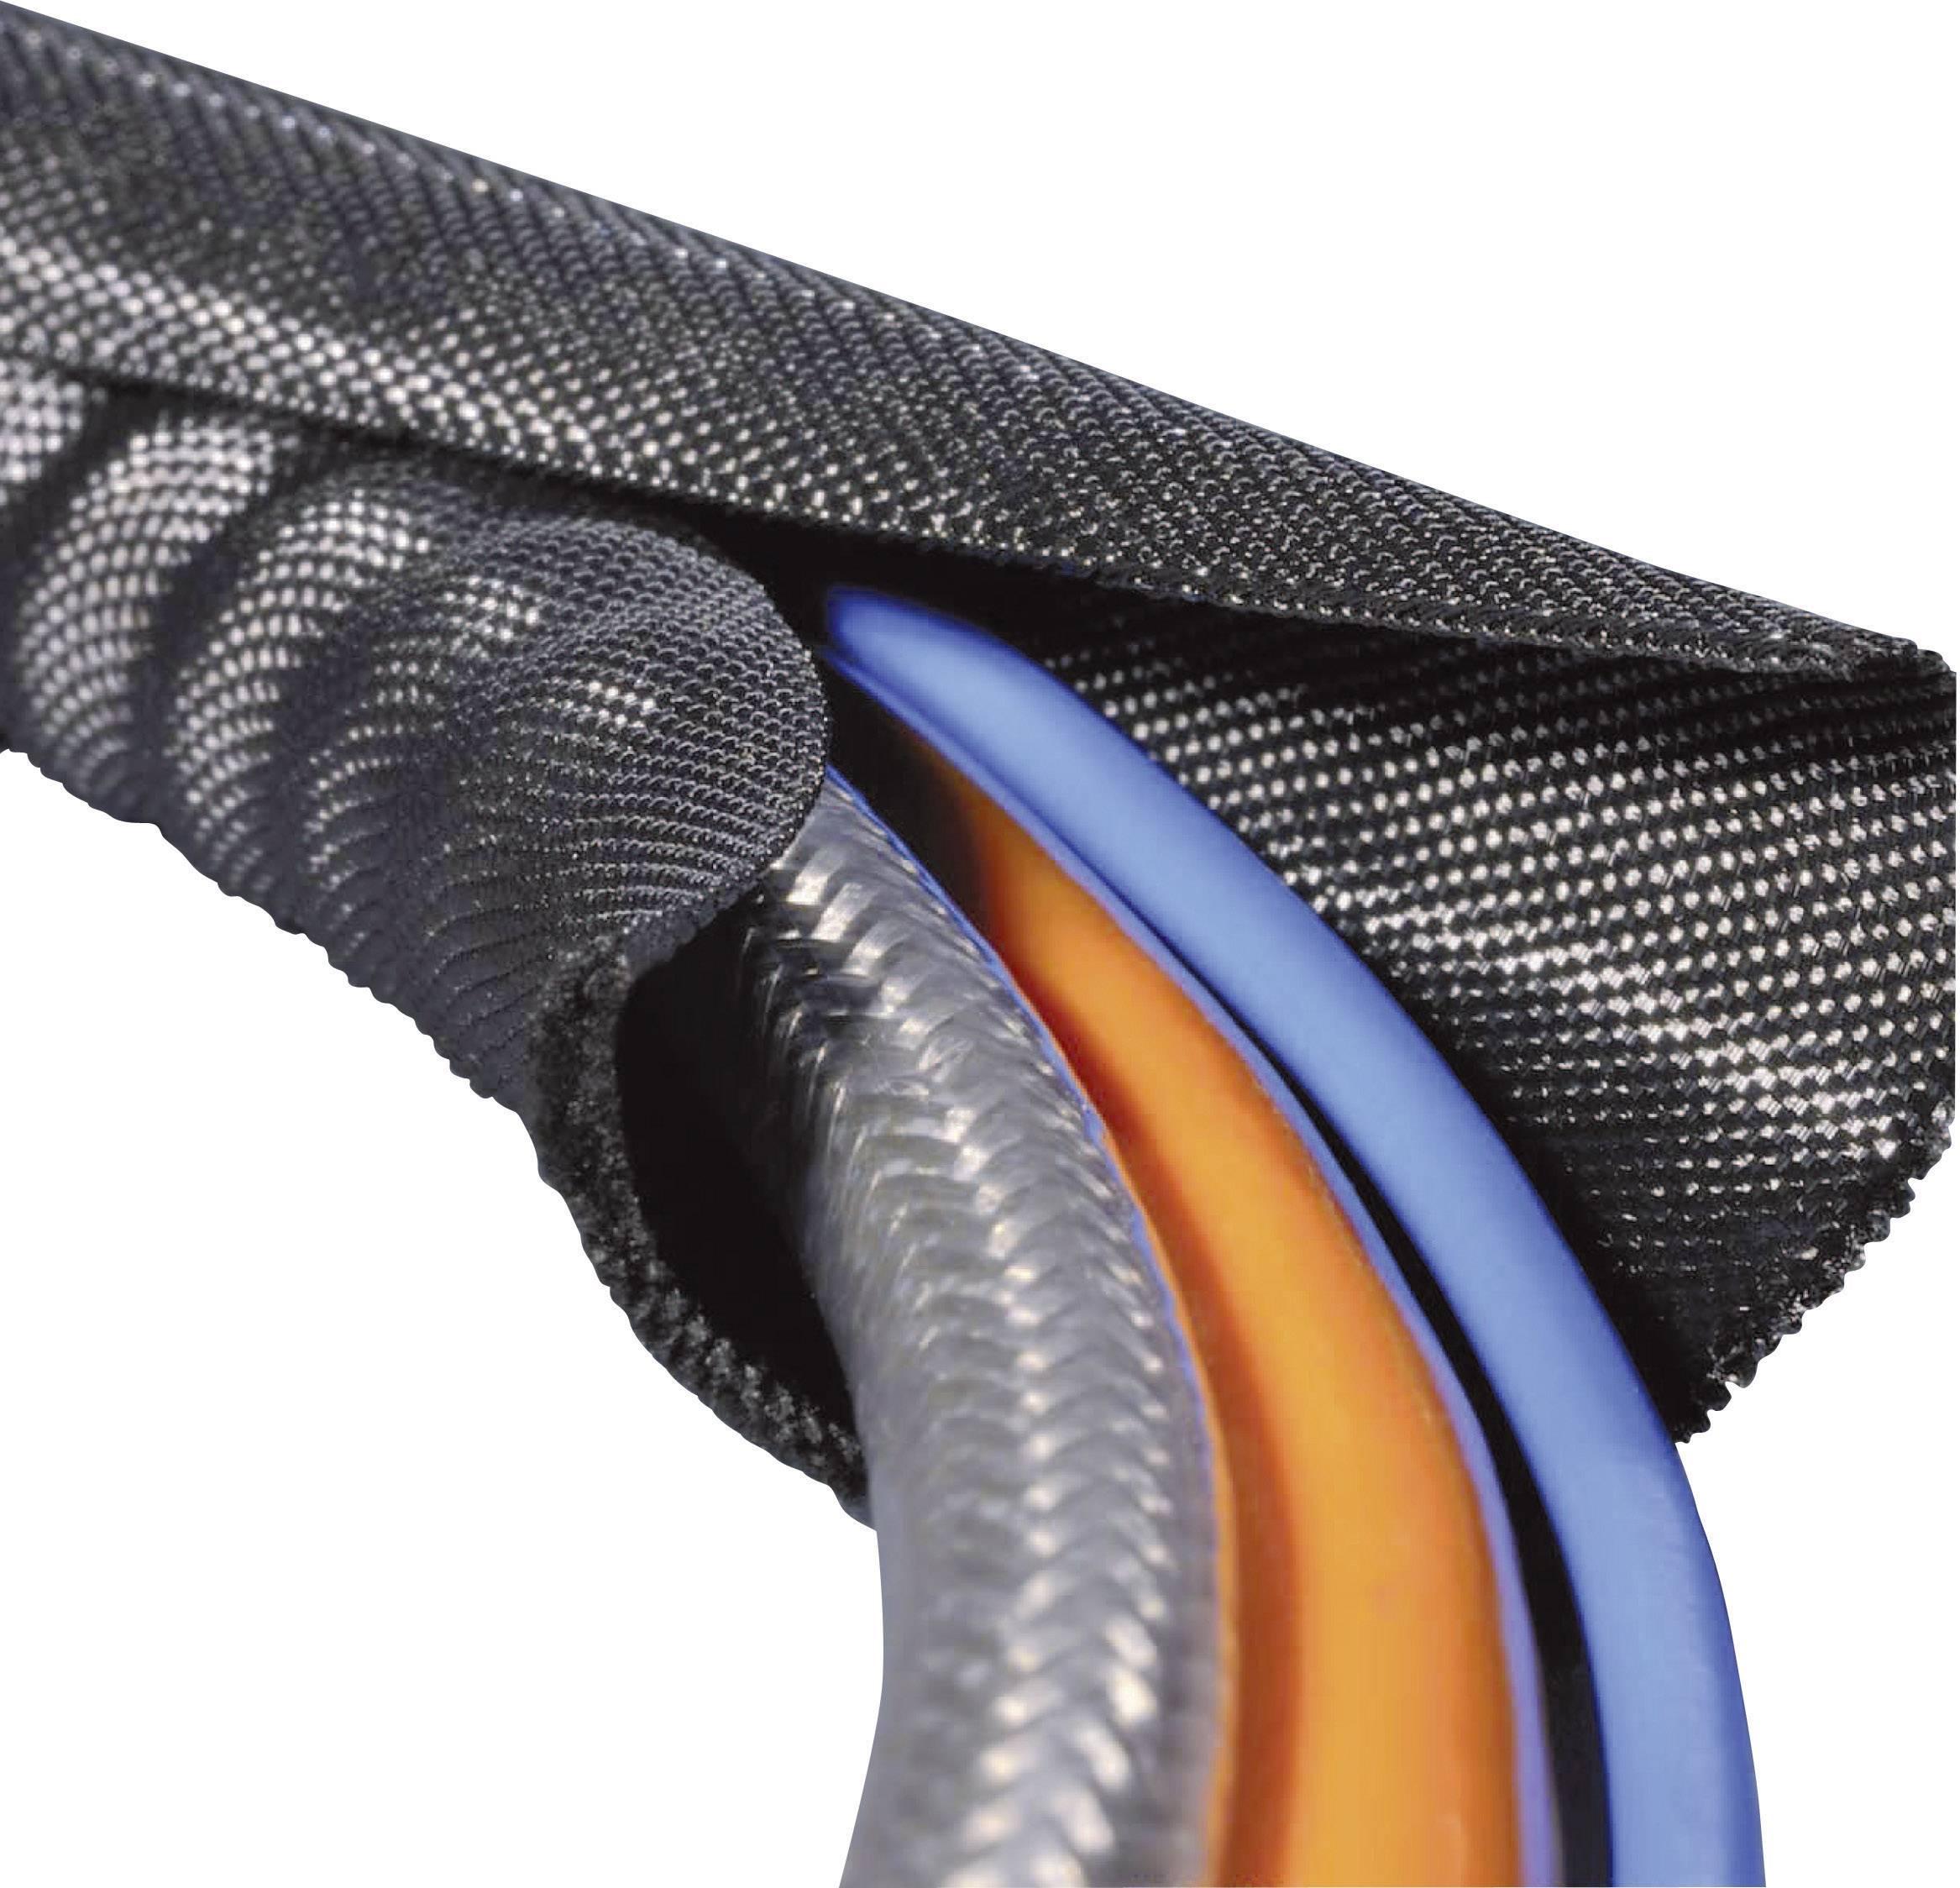 Ochranný oplet HellermannTyton Twist-In 32, 29 do 32 mm, -70 do +125 °C, metrový tovar, čierna